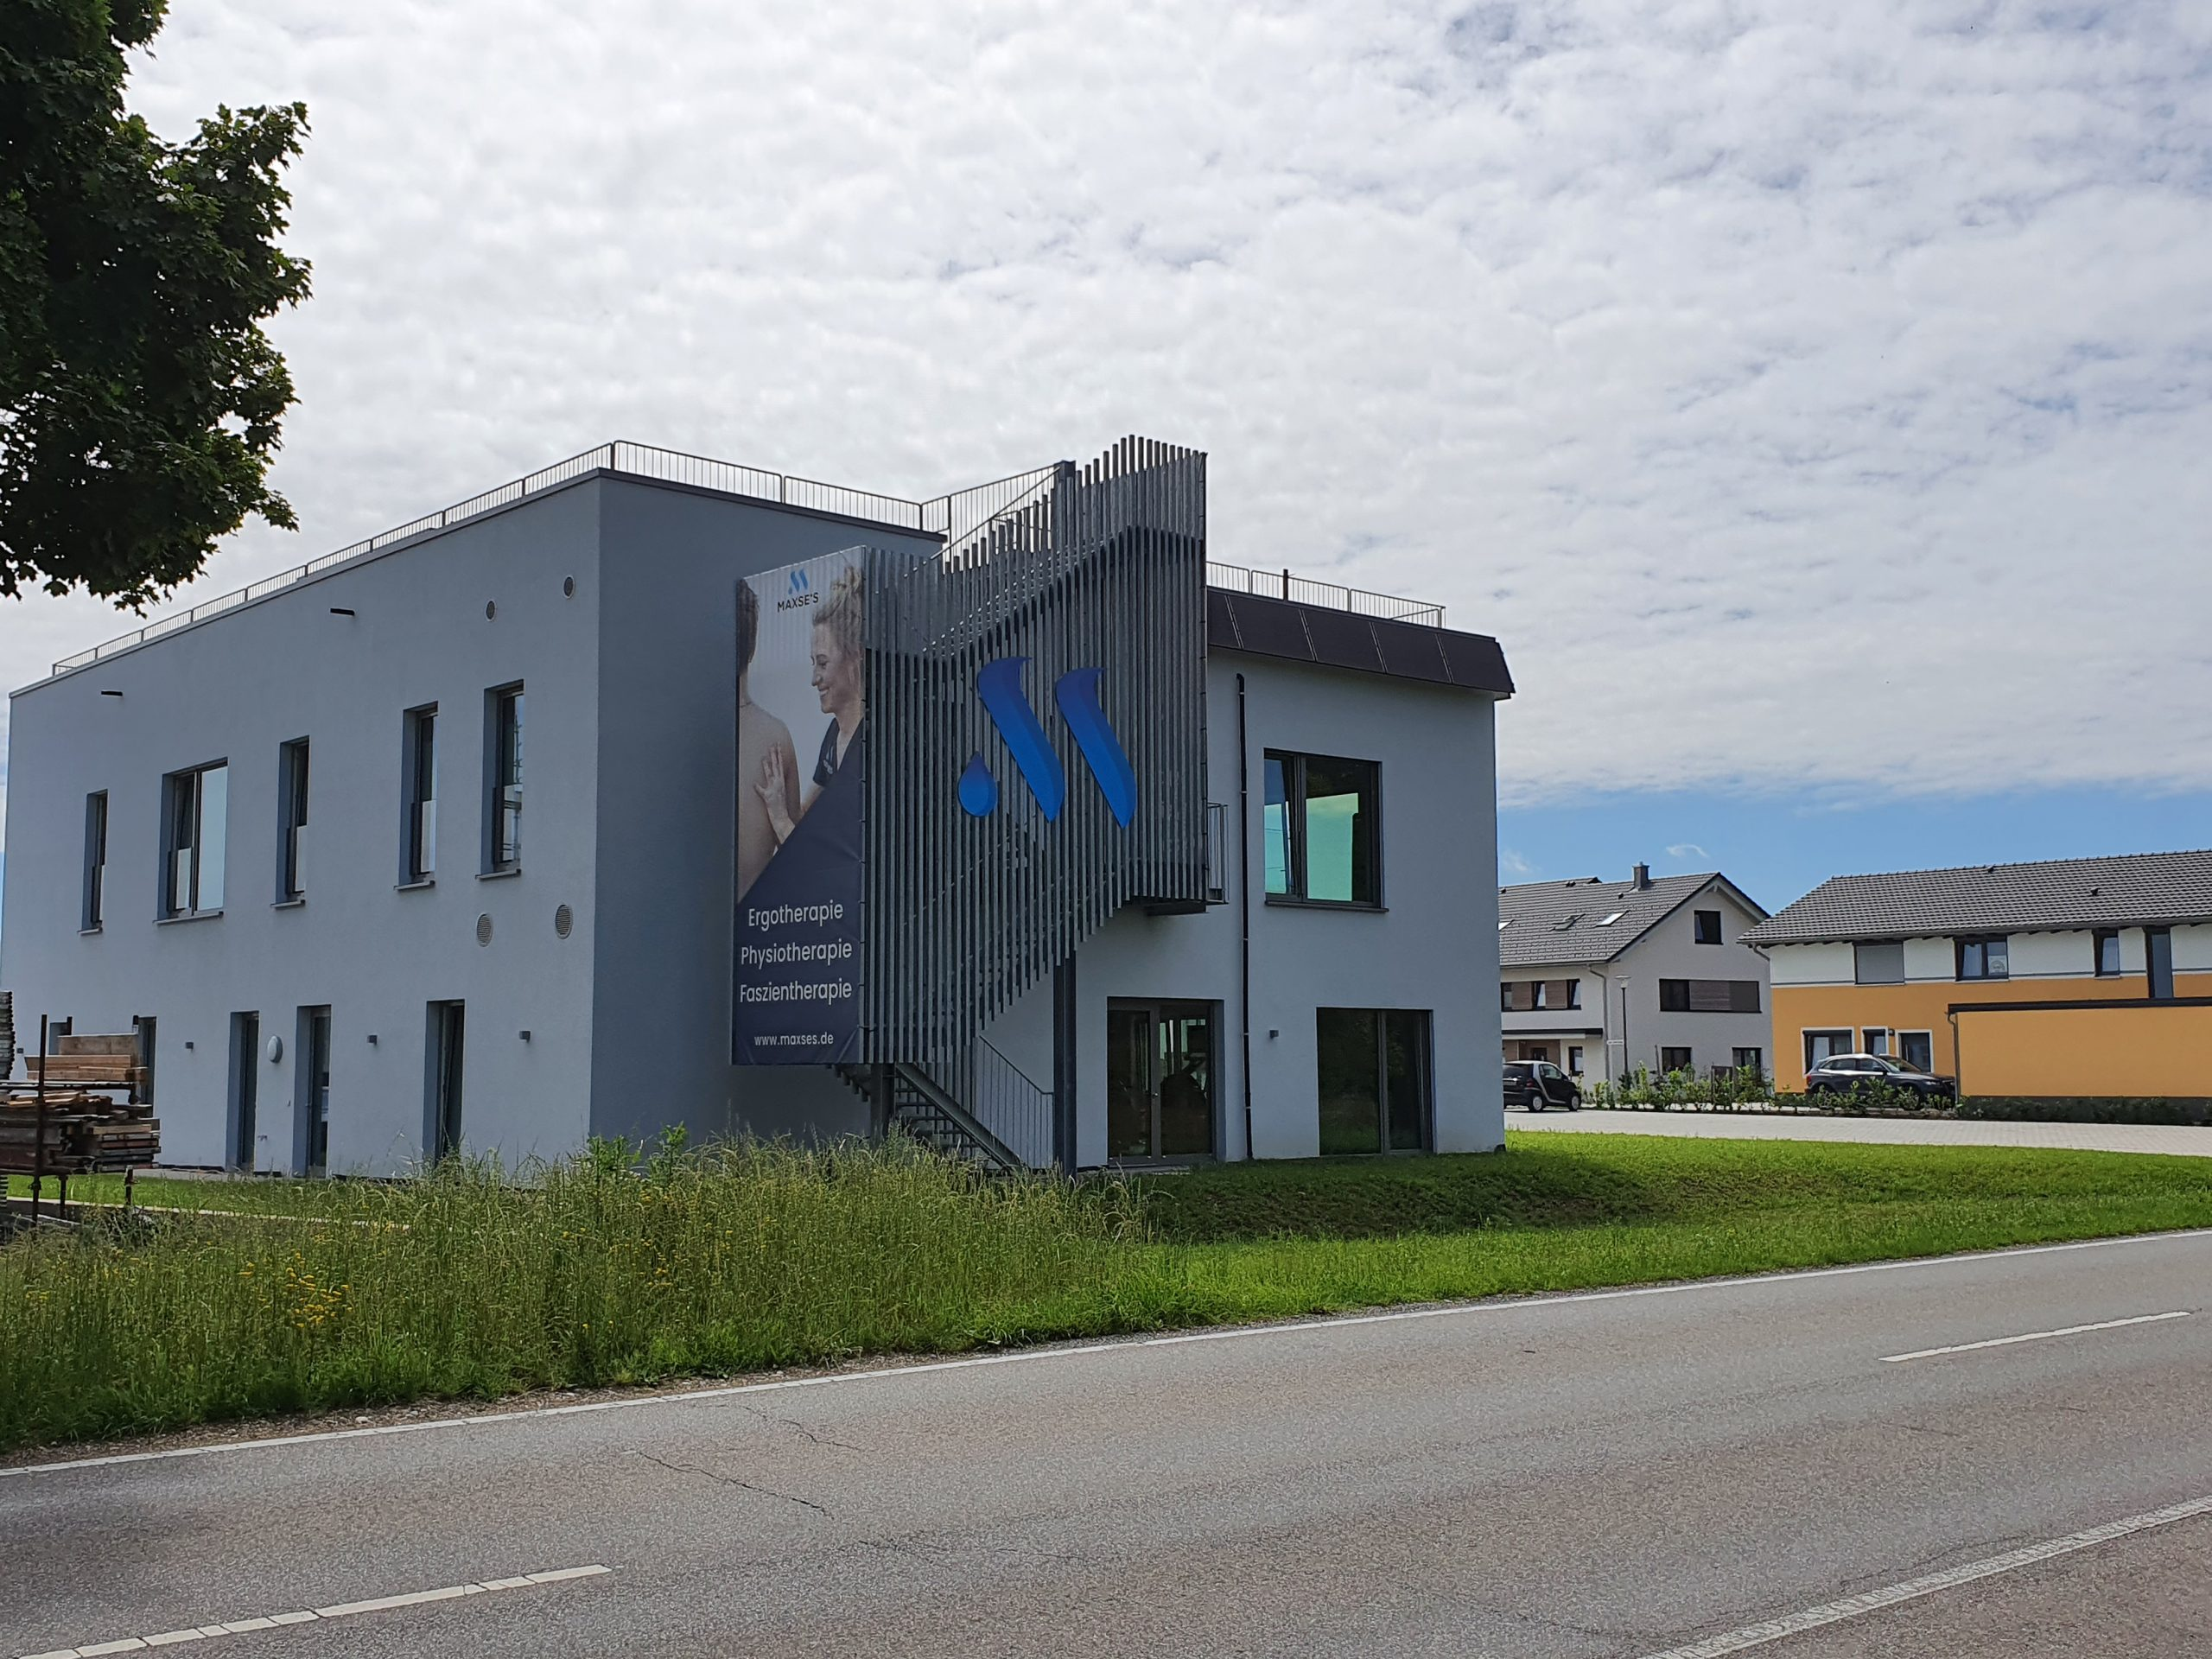 Standort - Kisslegg - Maxse's